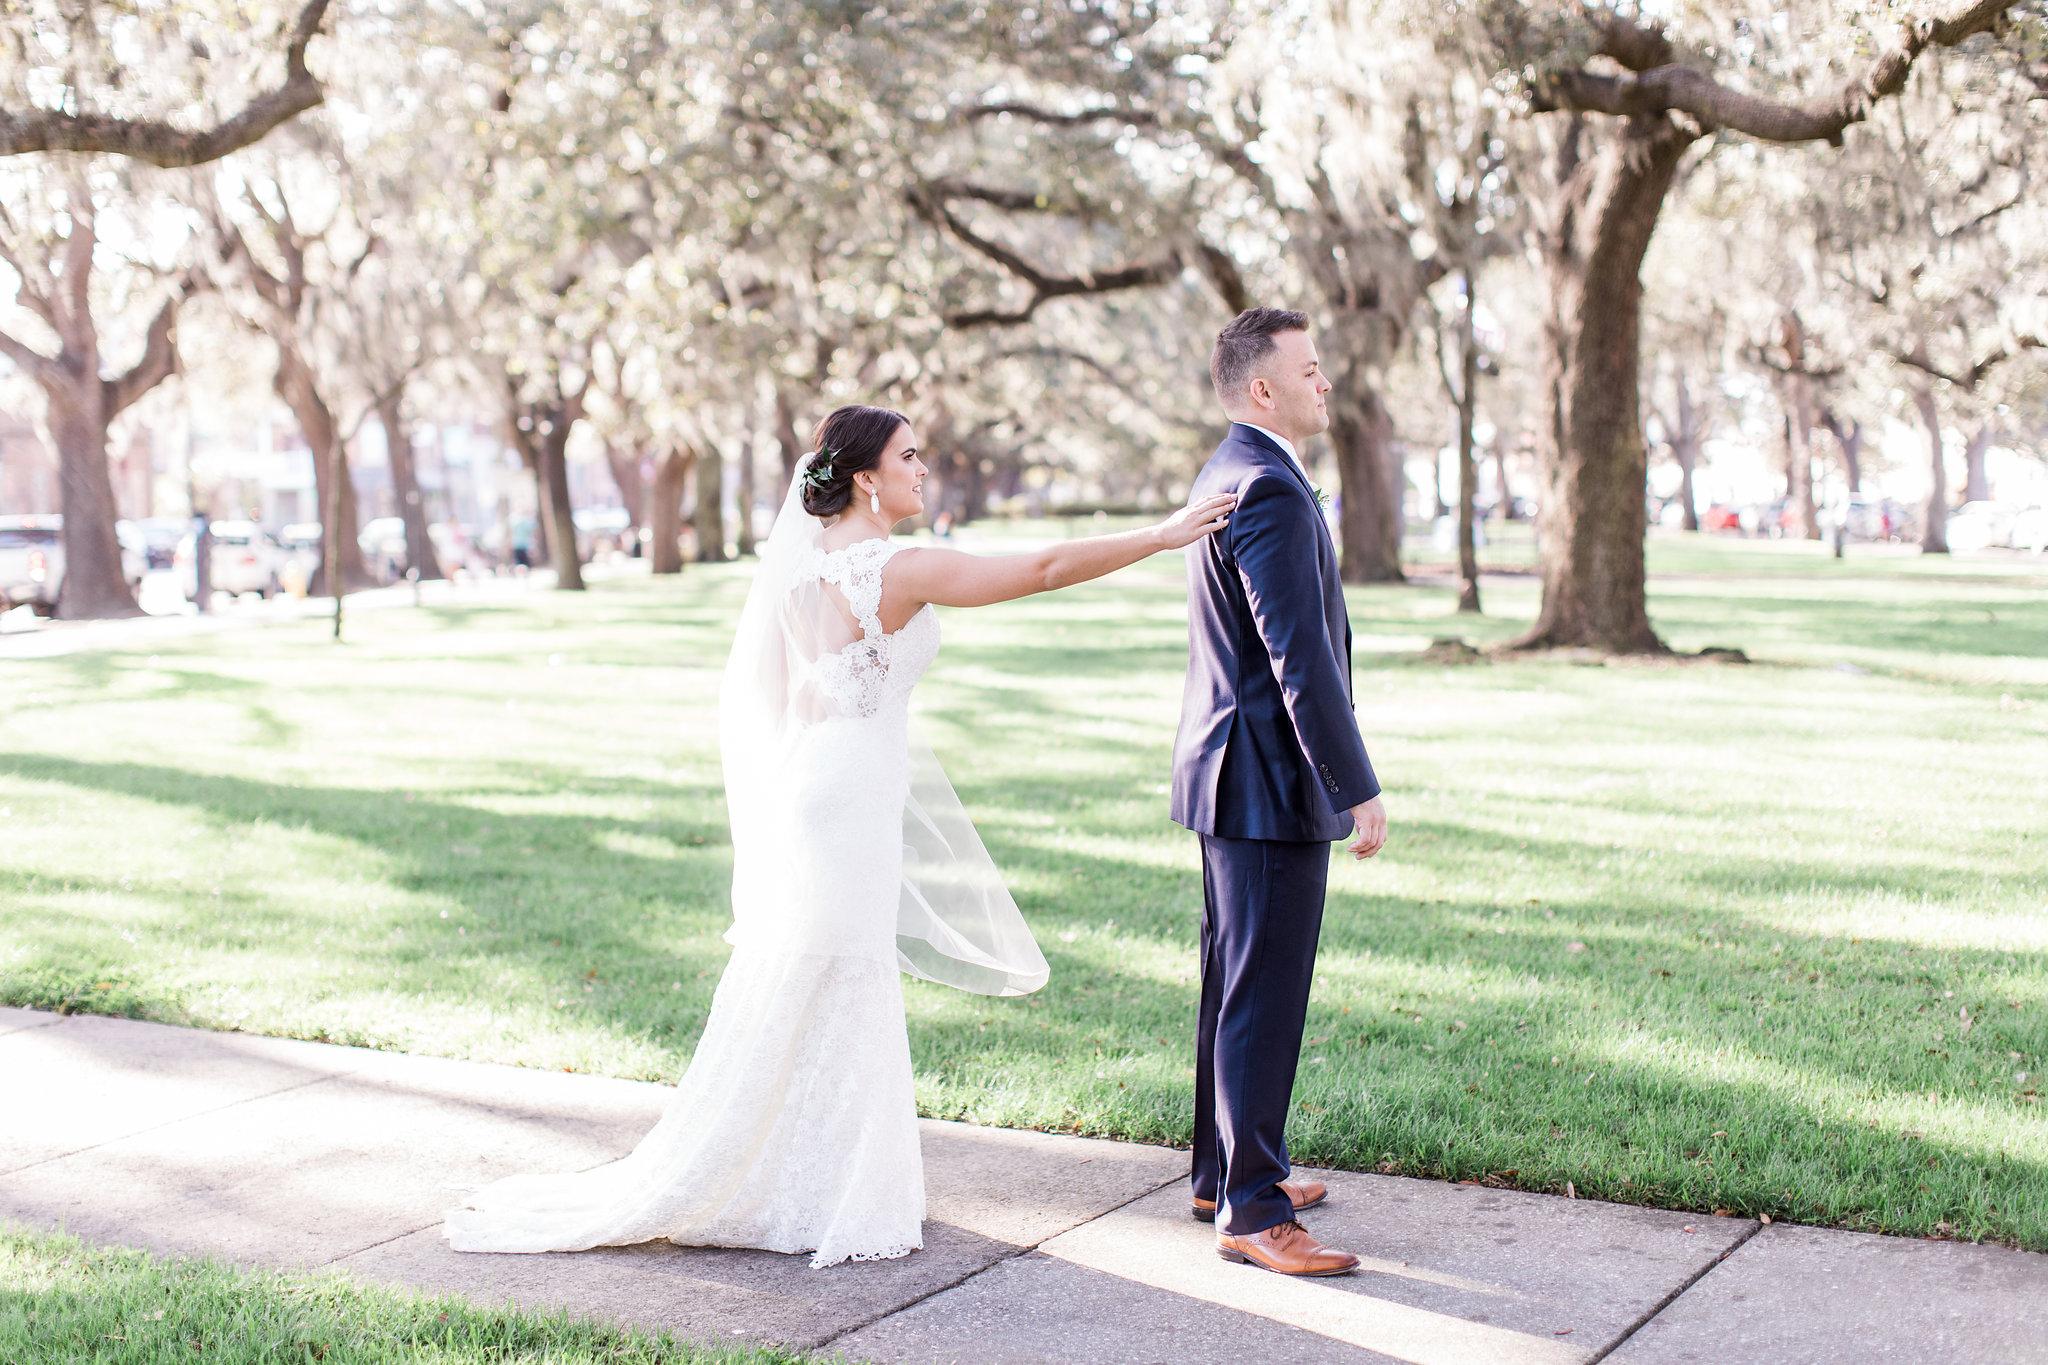 apt-b-photography-Savannah-wedding-photographer-savannah-engagement-photographer-historic-savannah-engagement-charles-h-morris-center-wedding-savannah-weddings-14.JPG